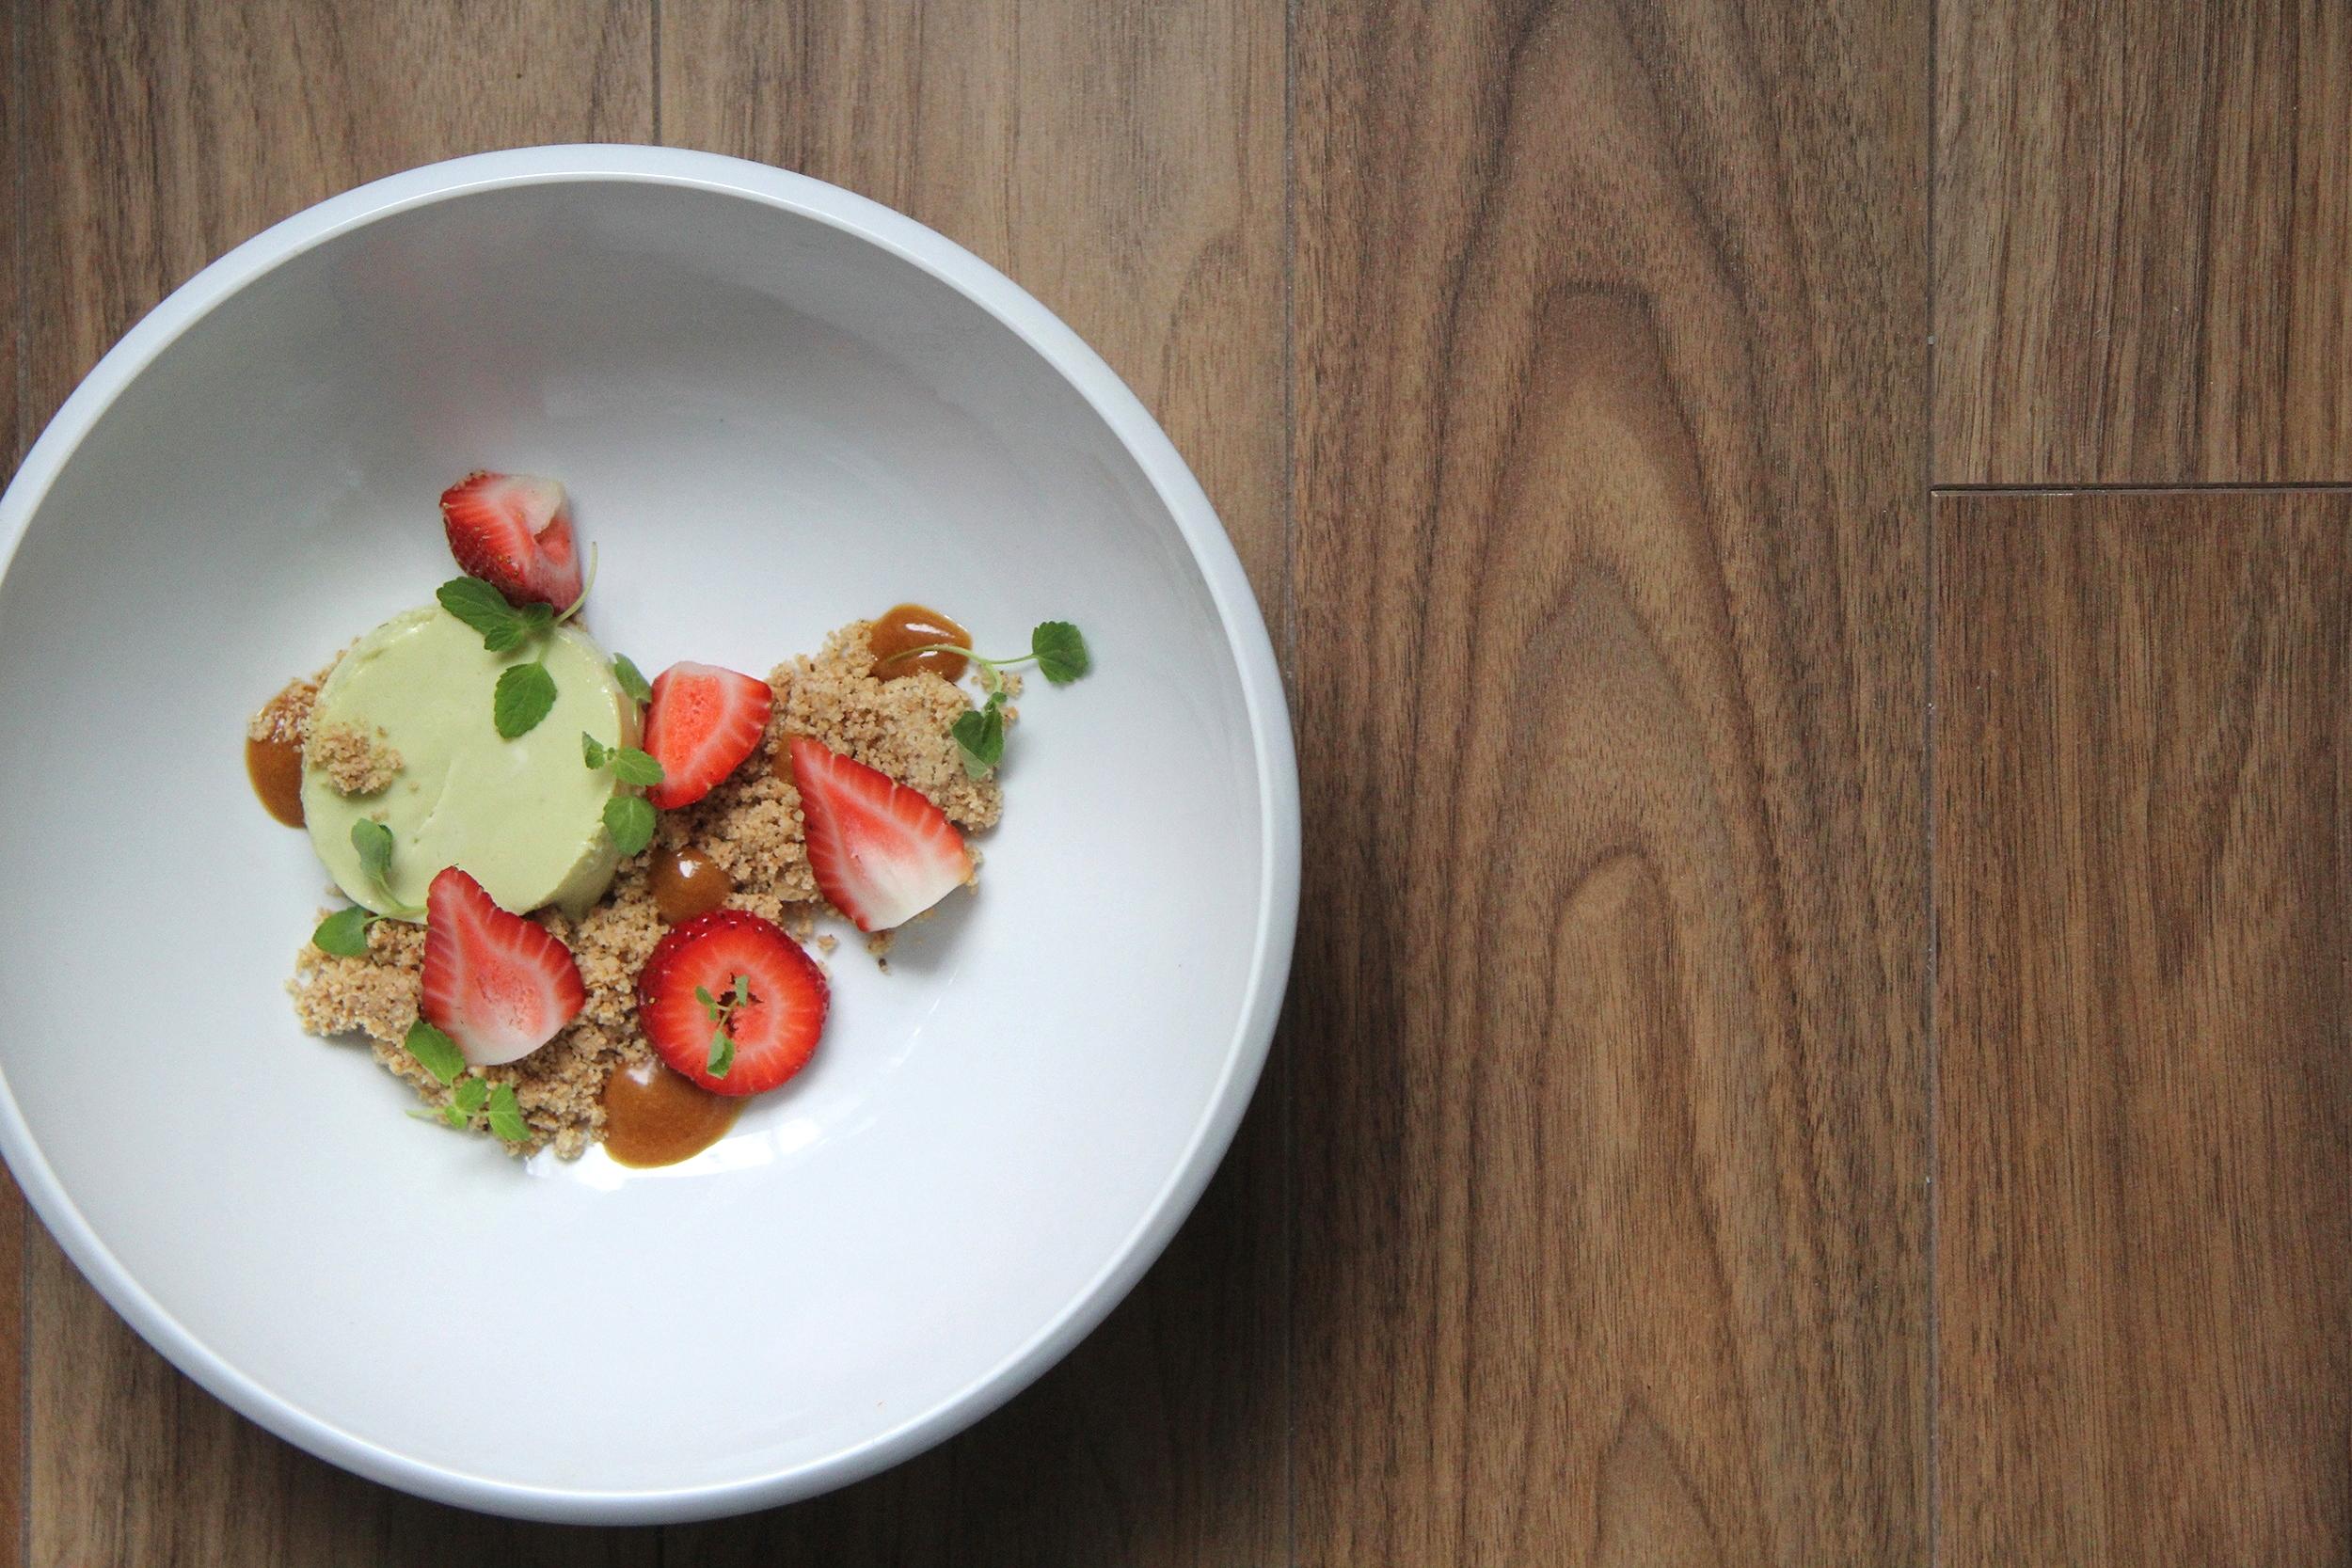 Matcha cheesecake. Hazelnut crumb. Fresh strawberry. Caramel-yuzu.